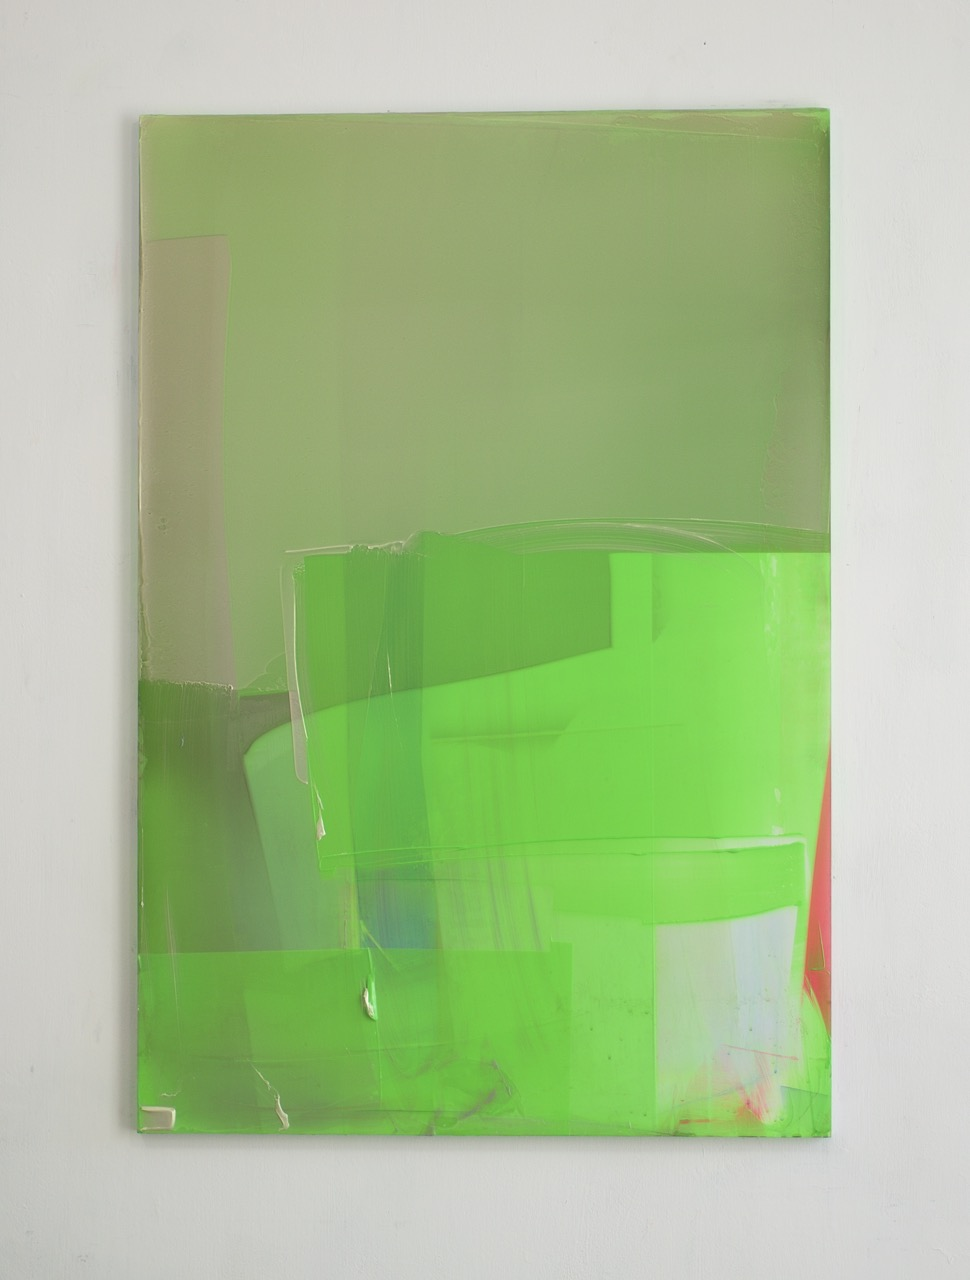 Untitled Green Composition, for John, 2016, 110x75cm.jpg